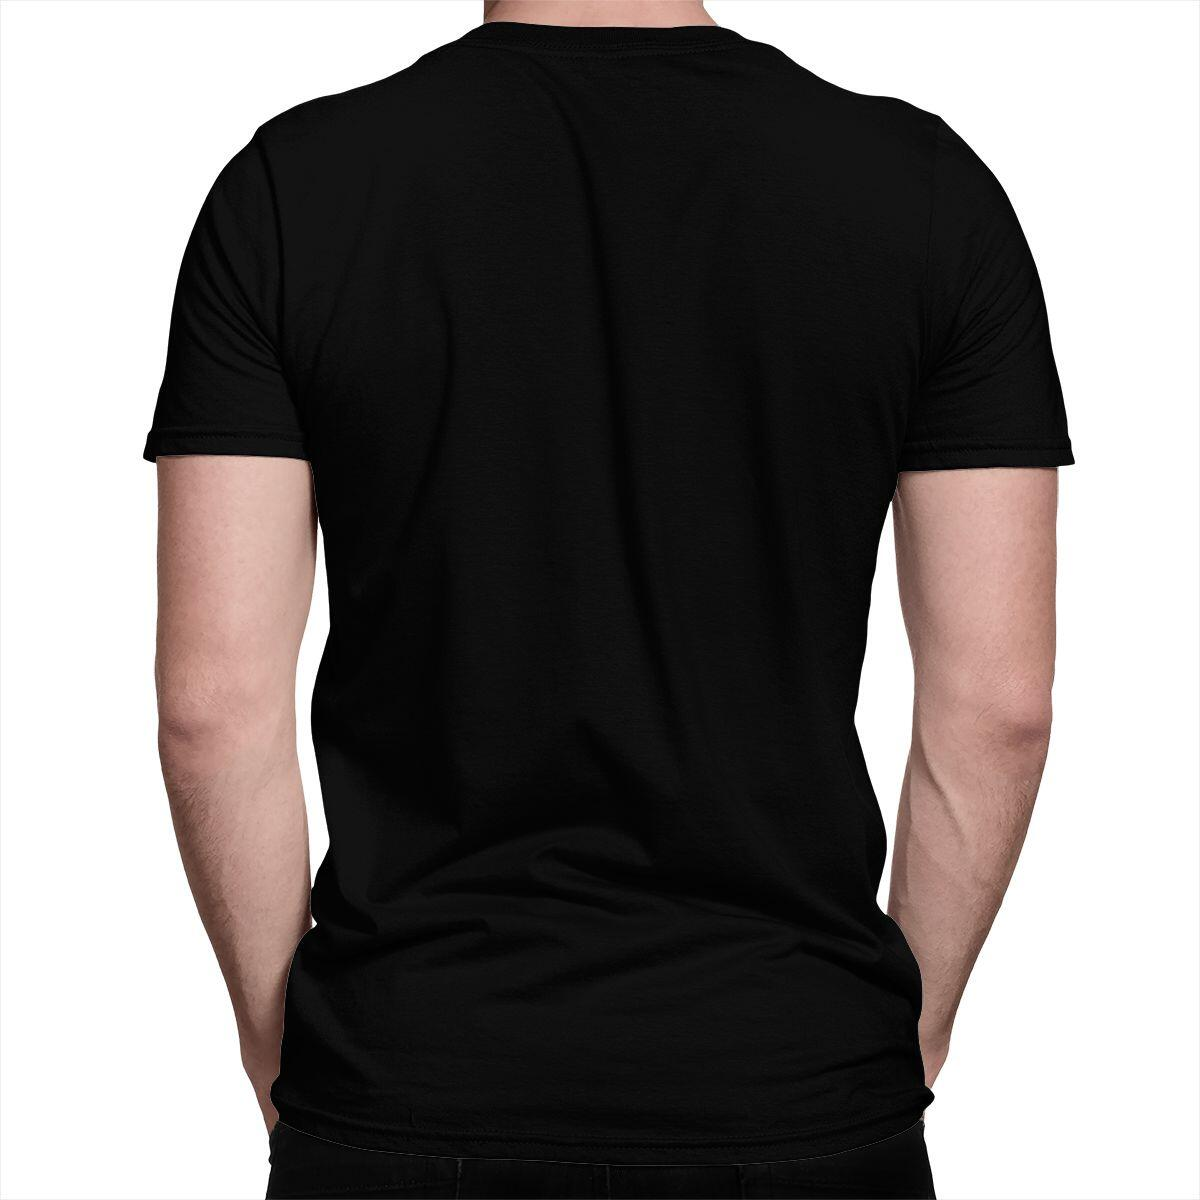 Friends Style Villager Shirt, Army Green / XXL